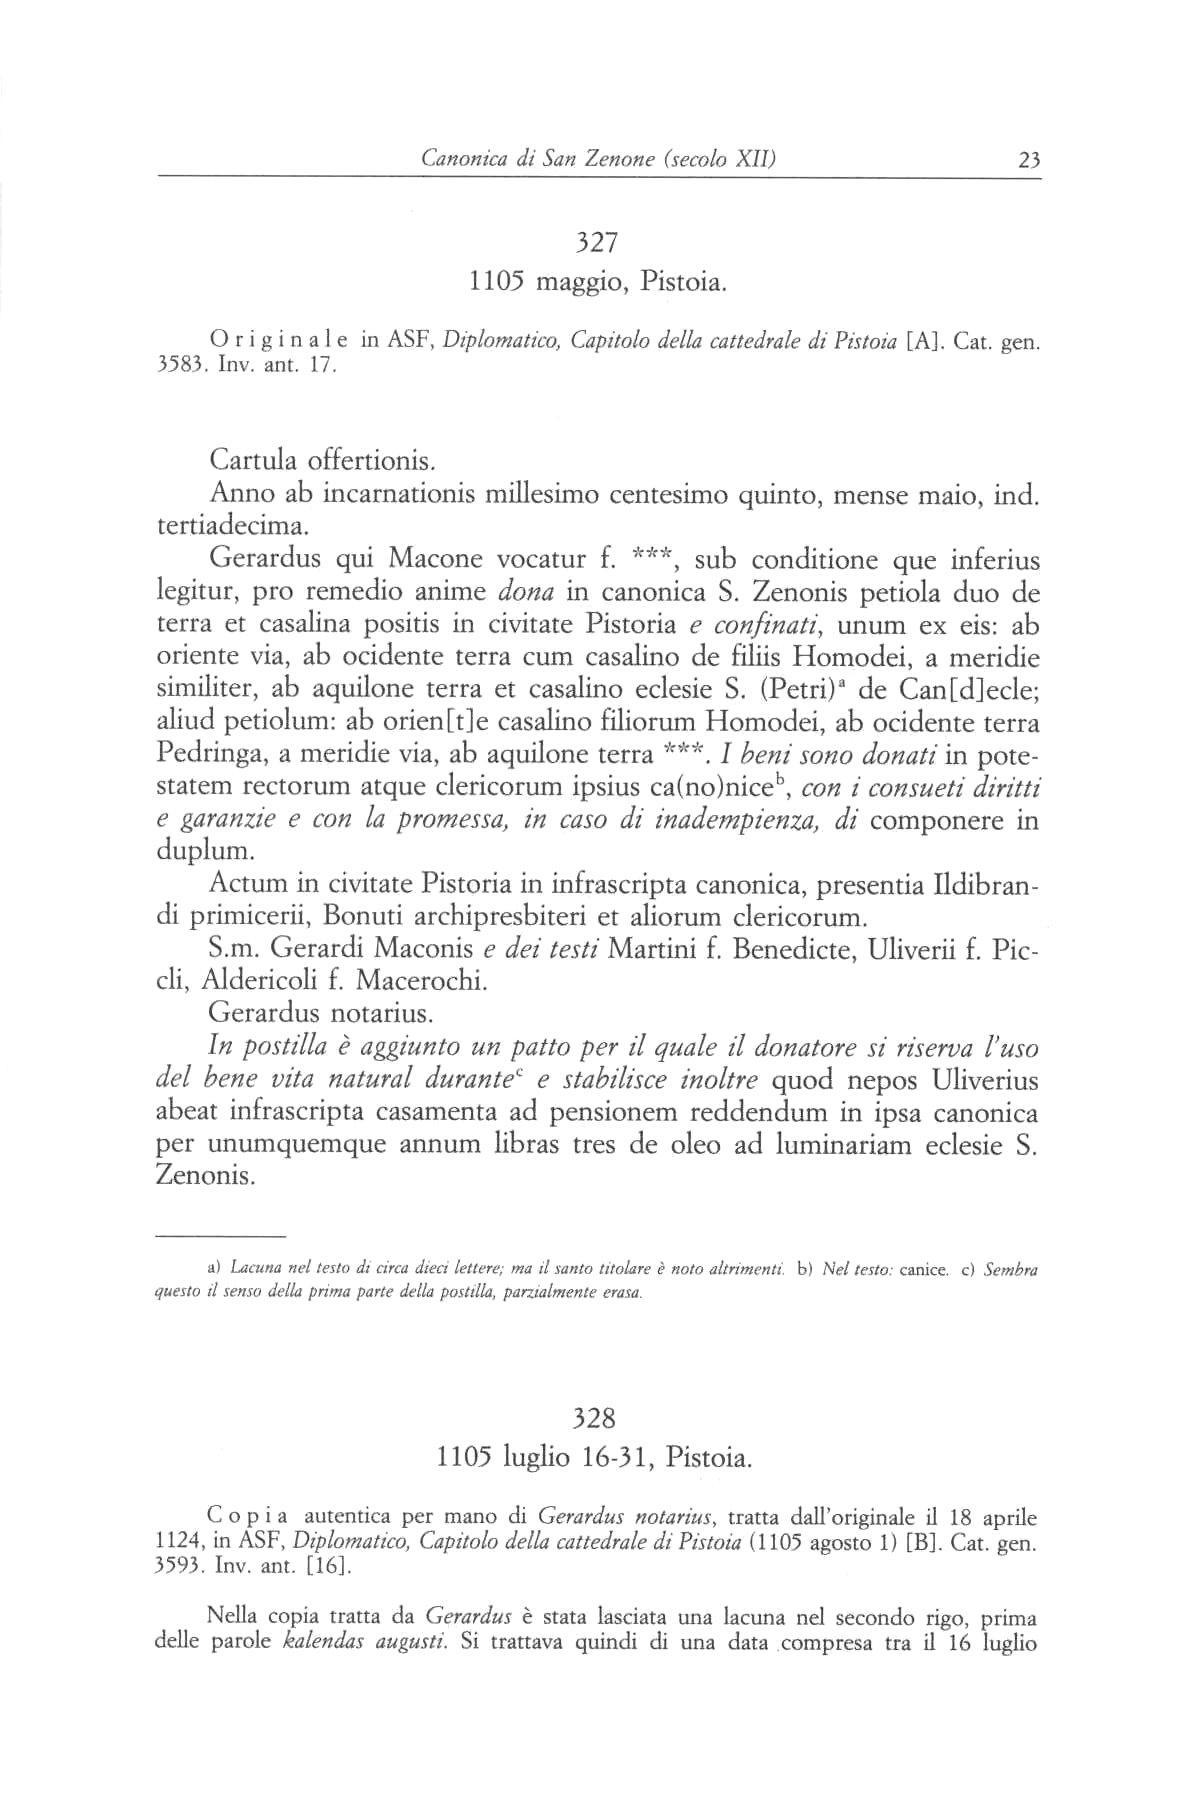 Canonica S. Zenone XII 0023.jpg